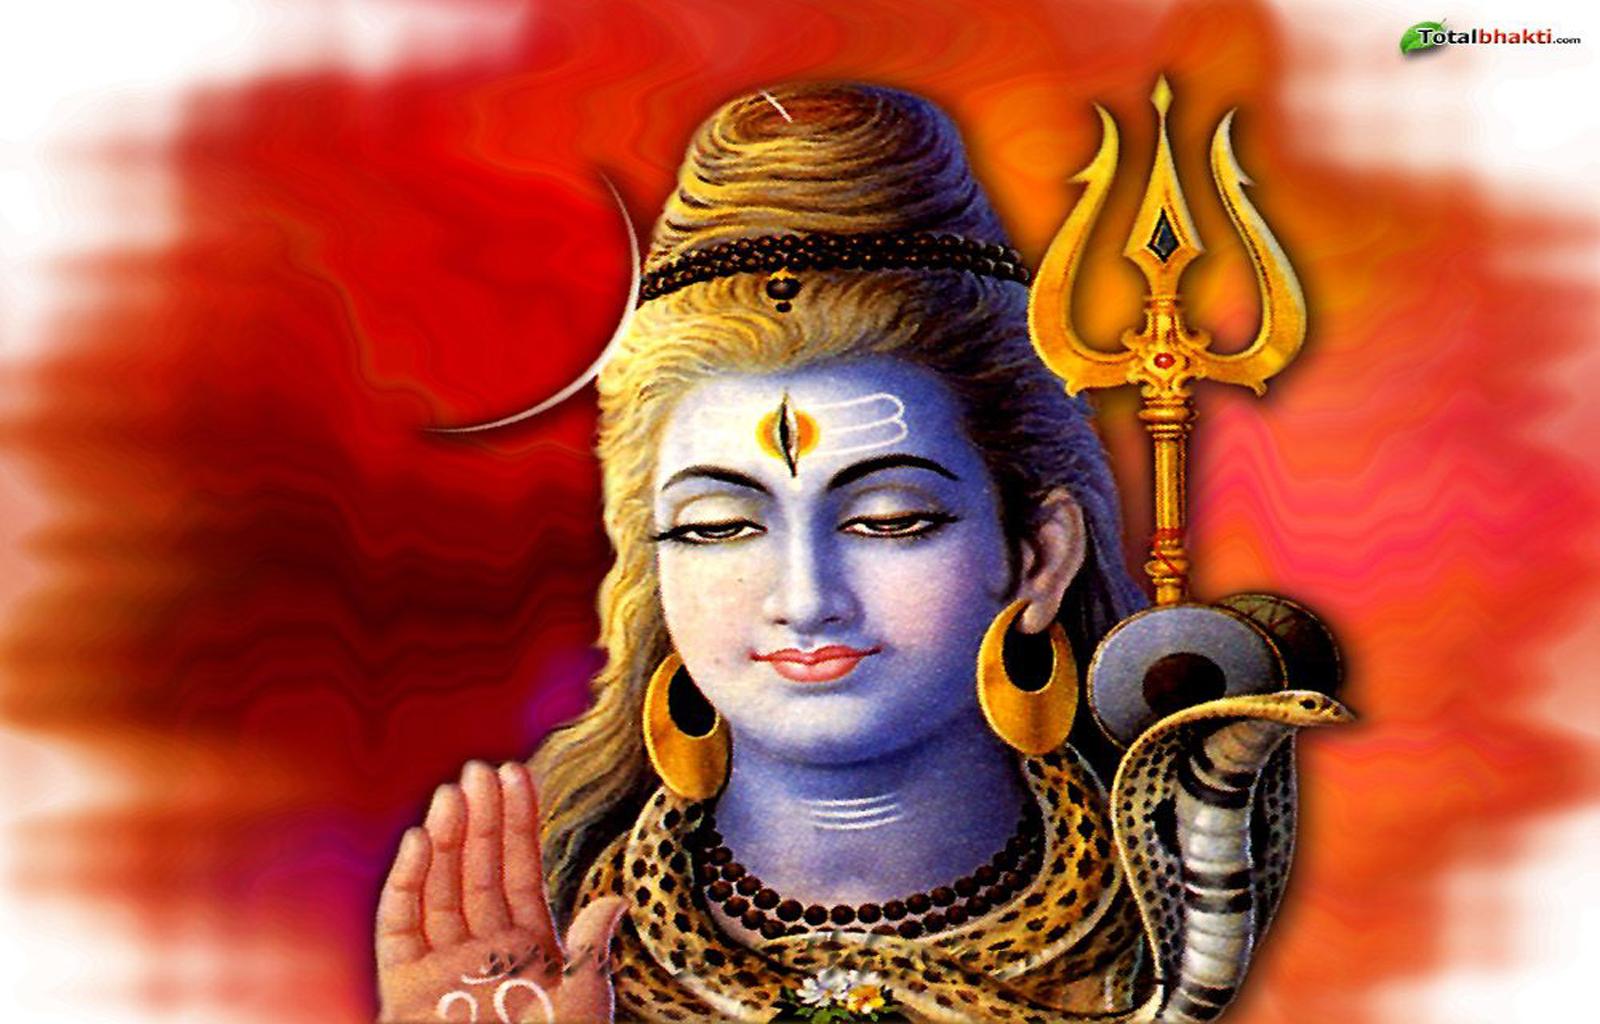 Ganesh Bhagwan Hd Wallpaper Indian God Songs